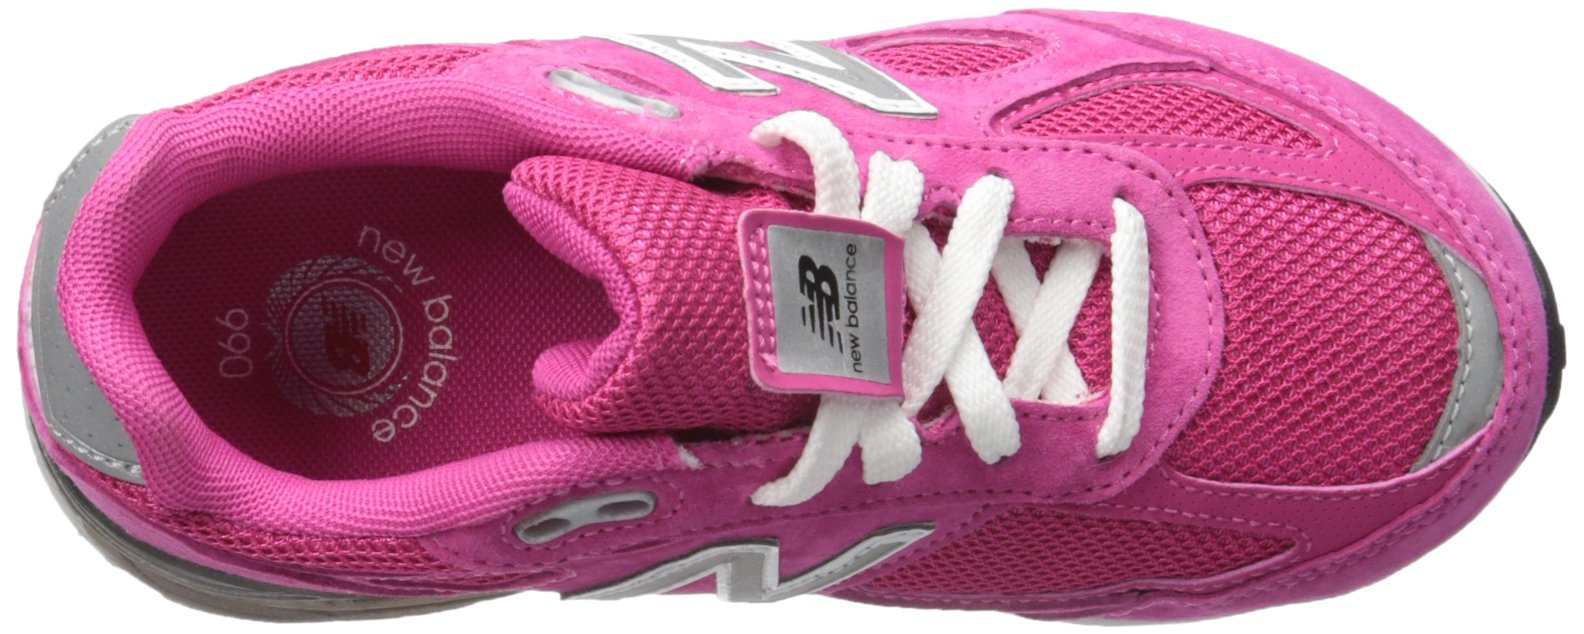 New Balance KJ990V4 Running Shoe , Pink/Pink, 1 M US Little Kid by New Balance (Image #8)